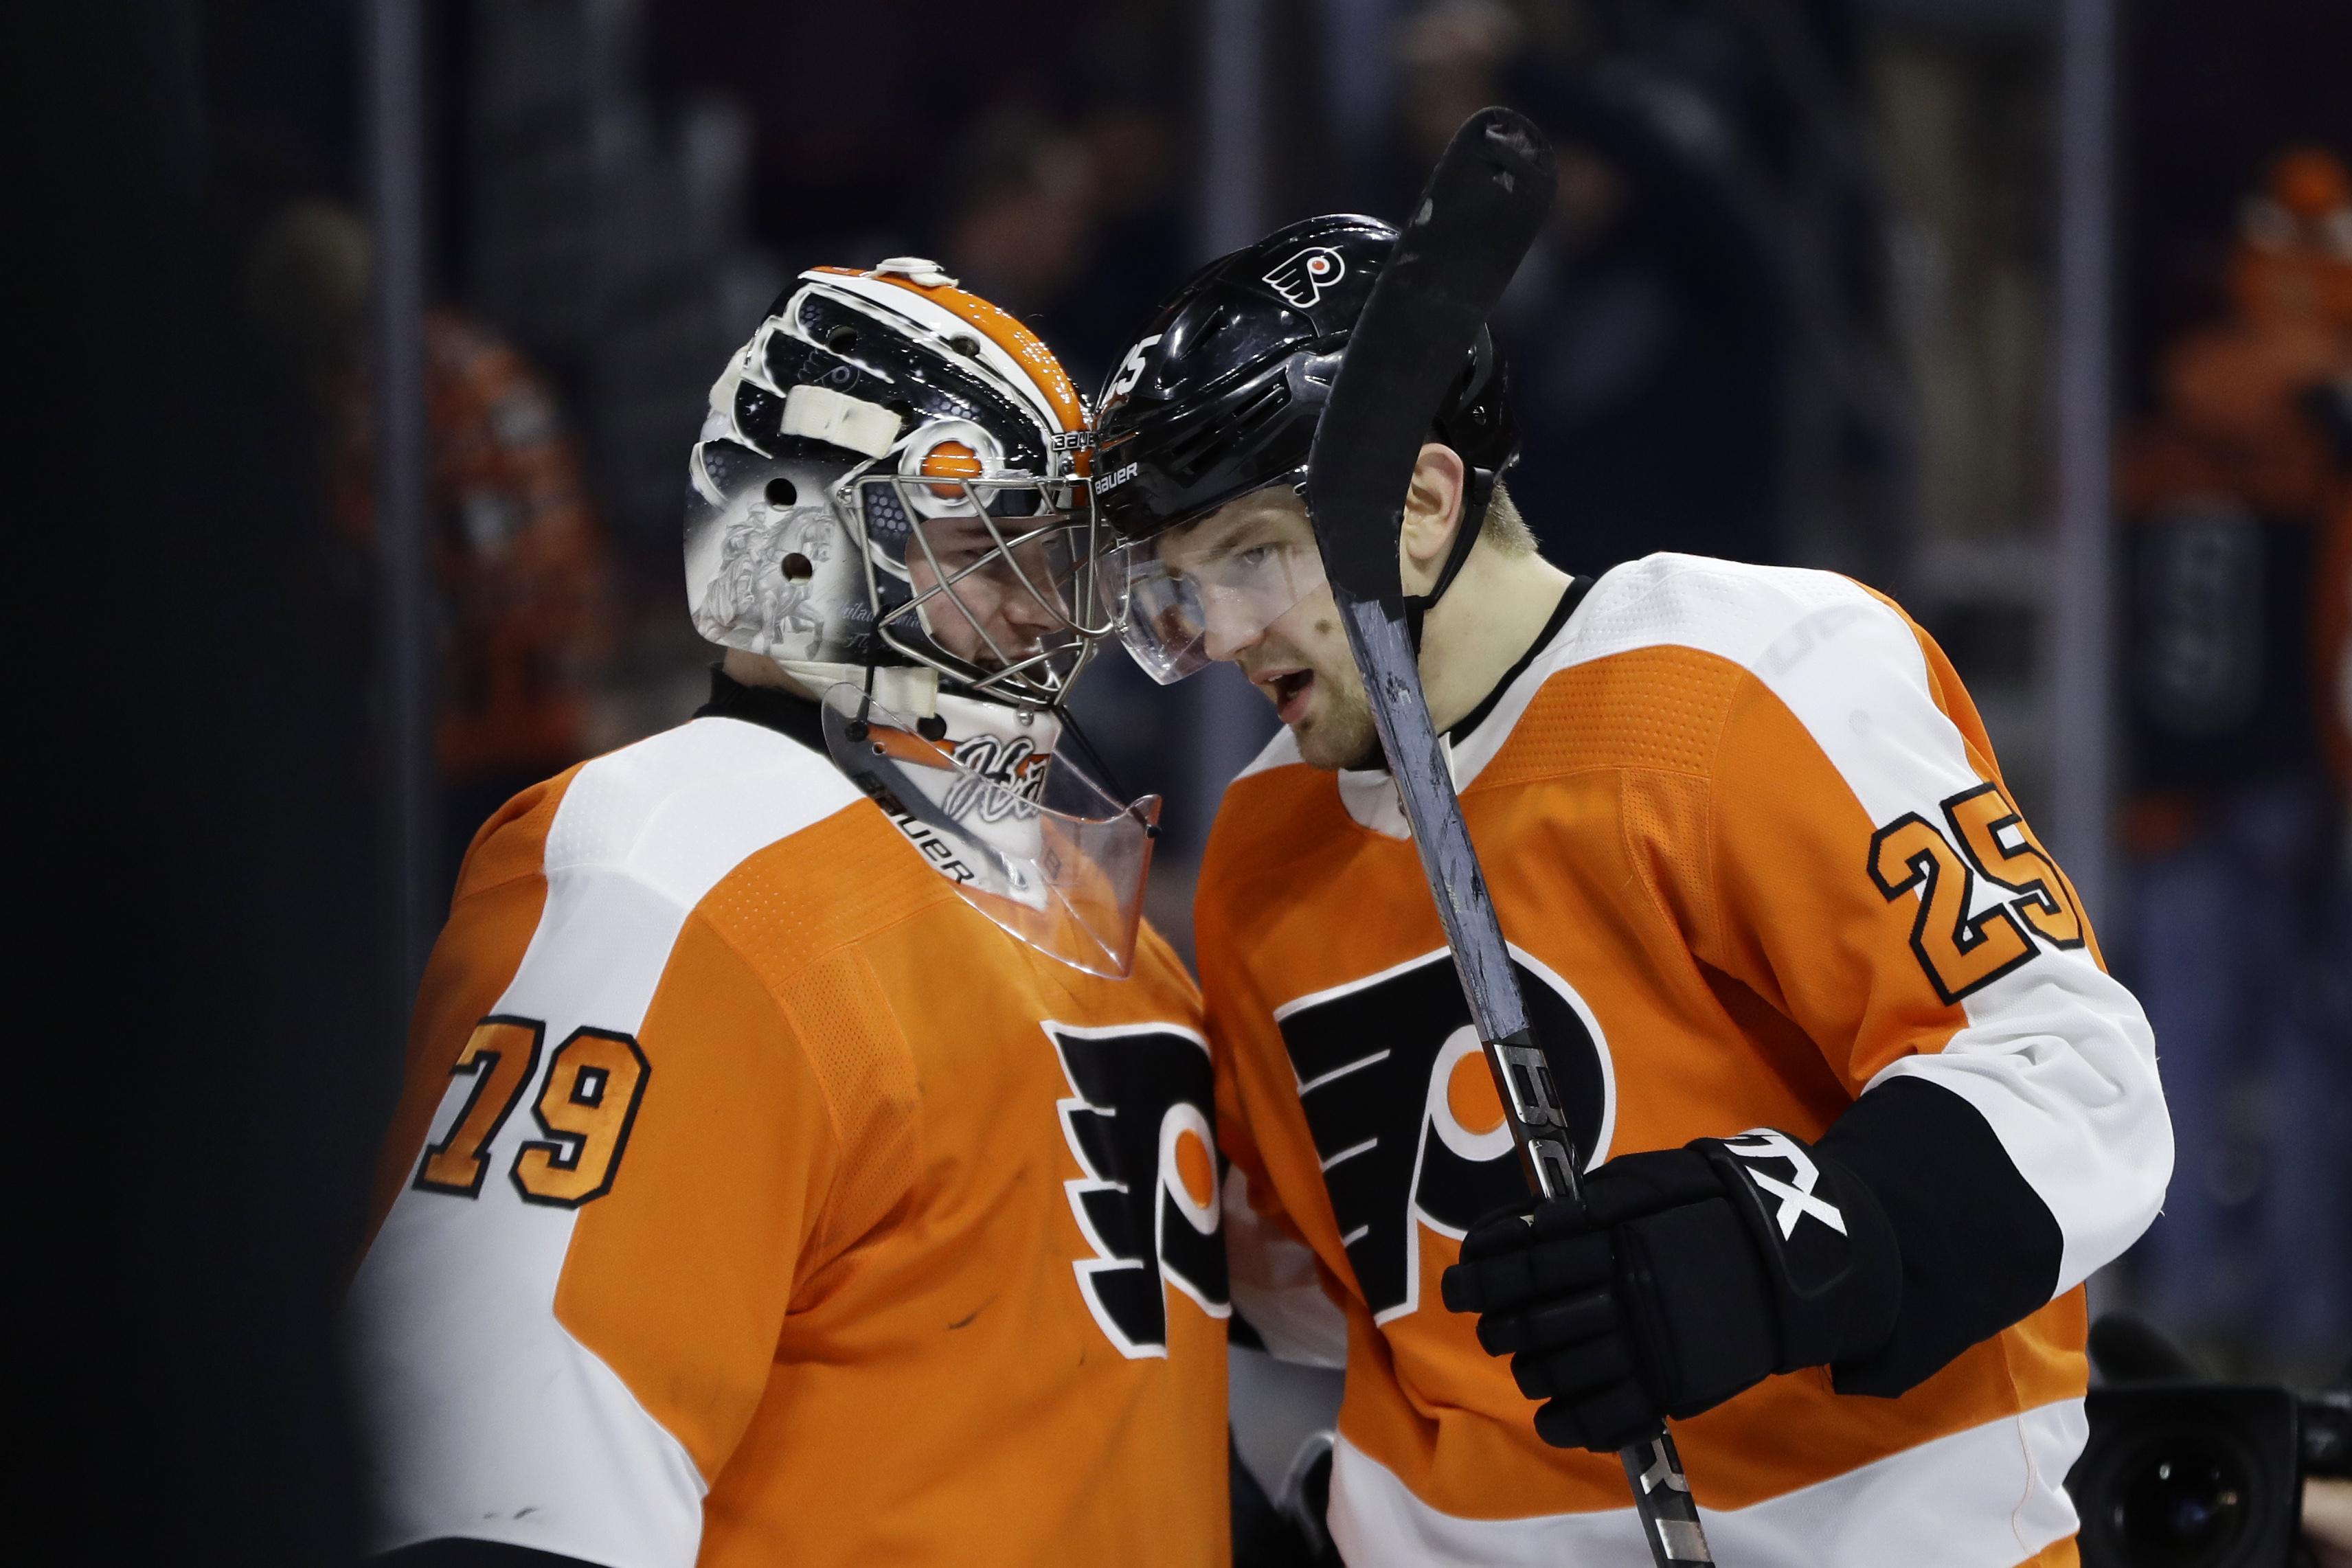 new arrival 4300e 8bec1 NHL roundup: James van Riemsdyk's hat trick earns rare win ...